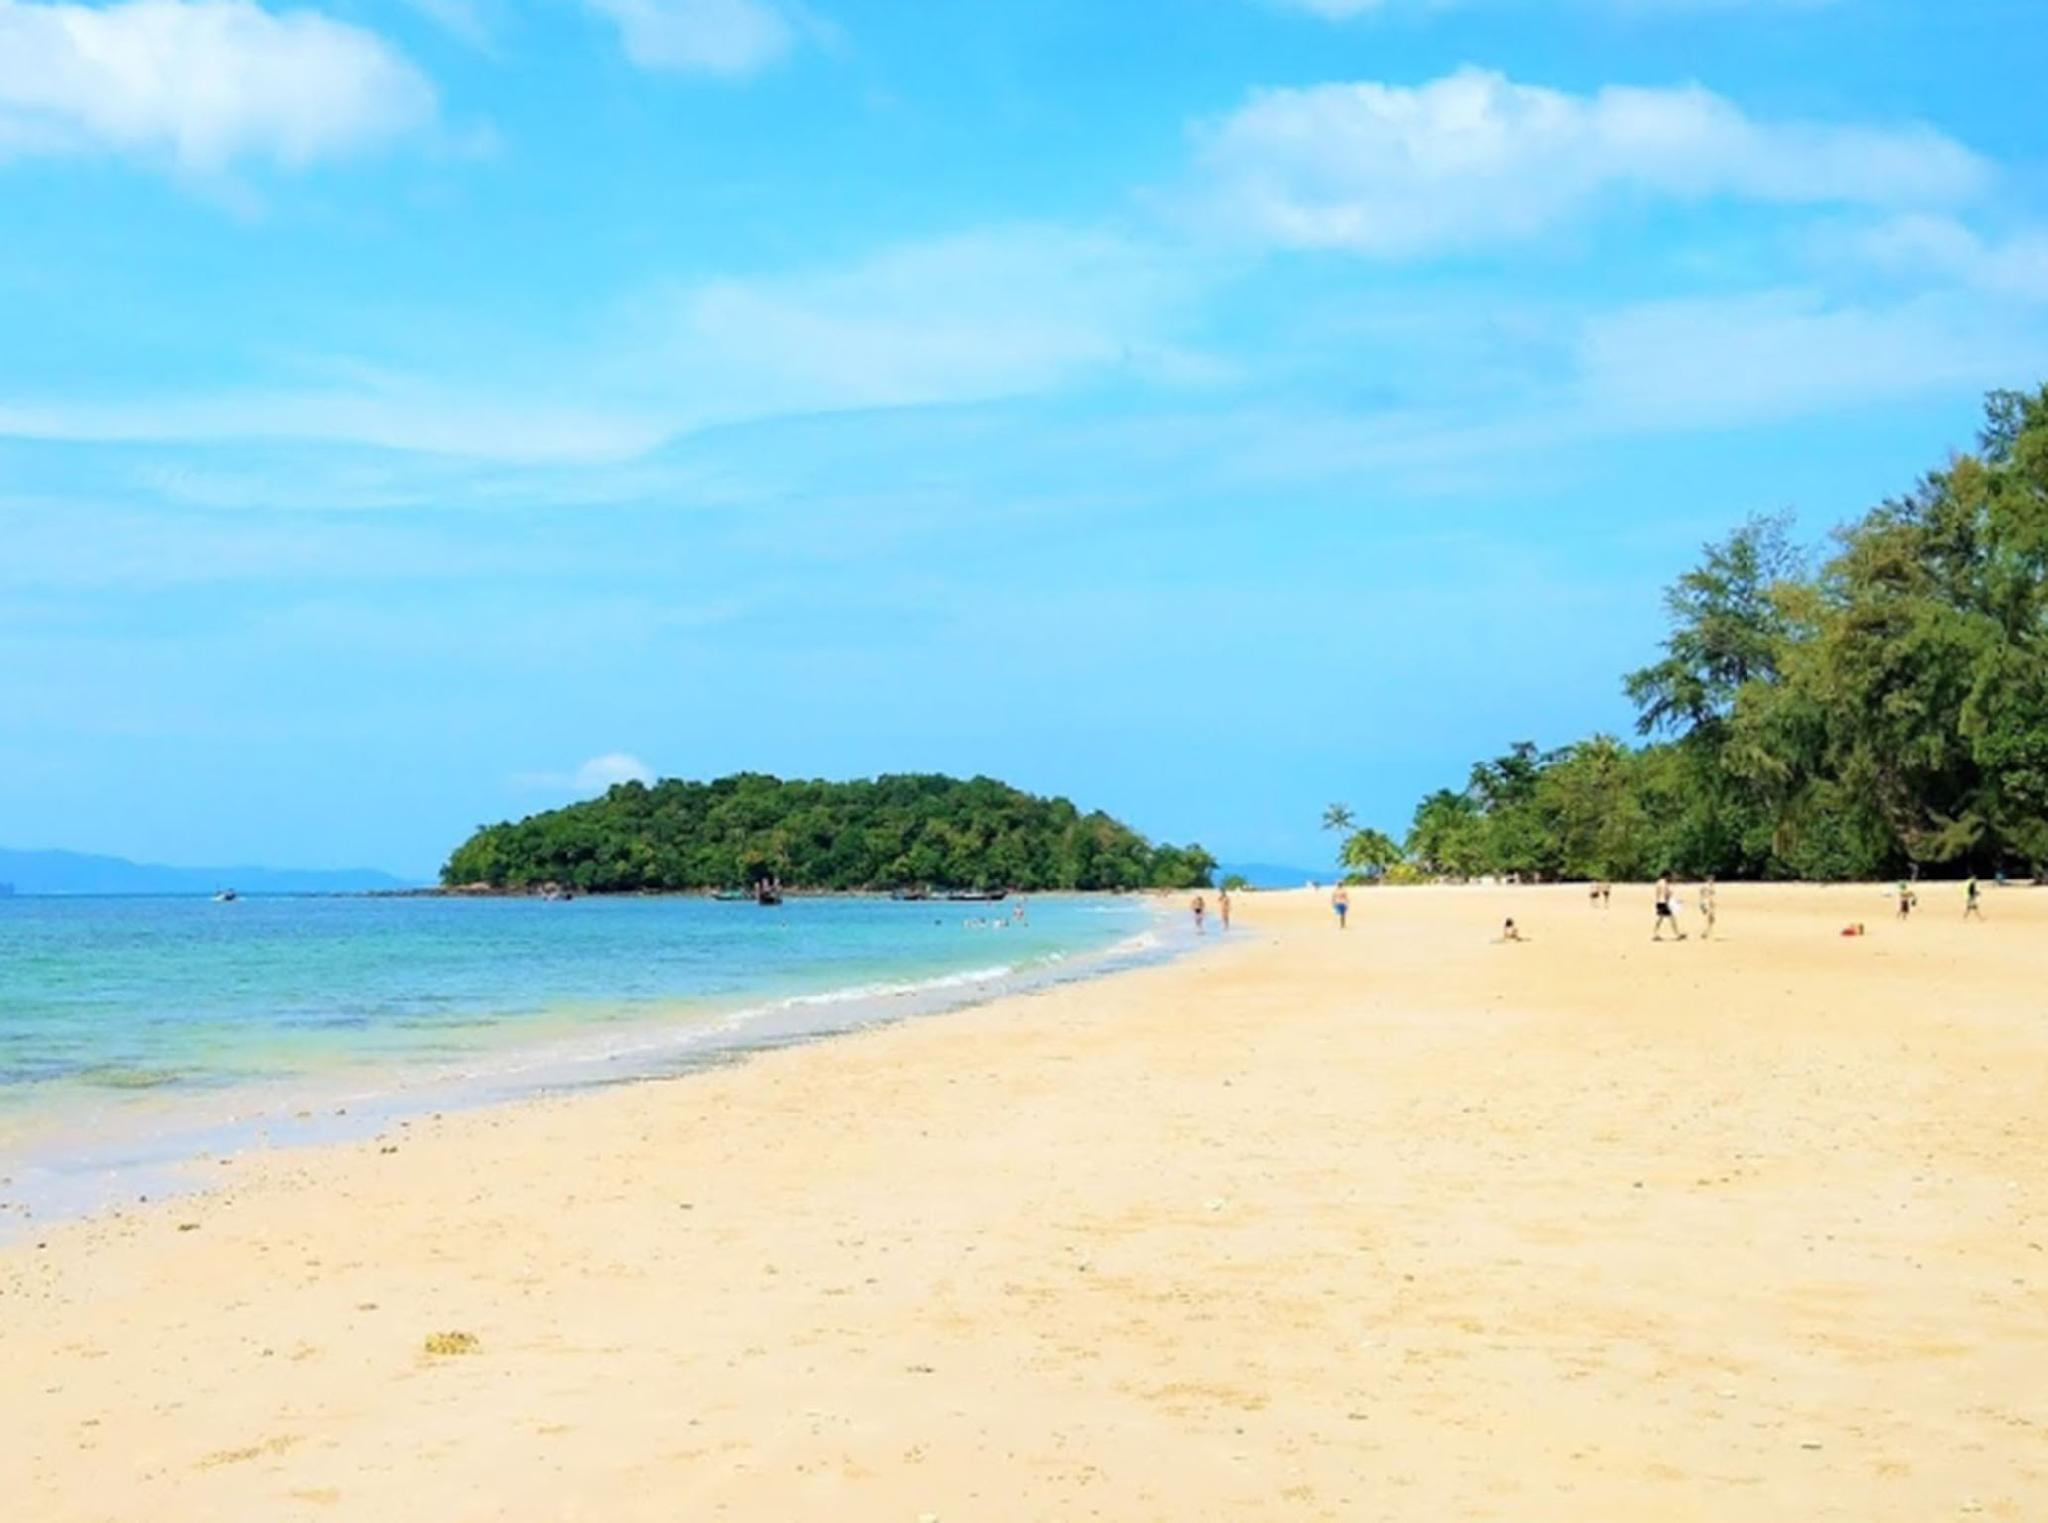 The Beach @ Klong Muang The Beach @ Klong Muang